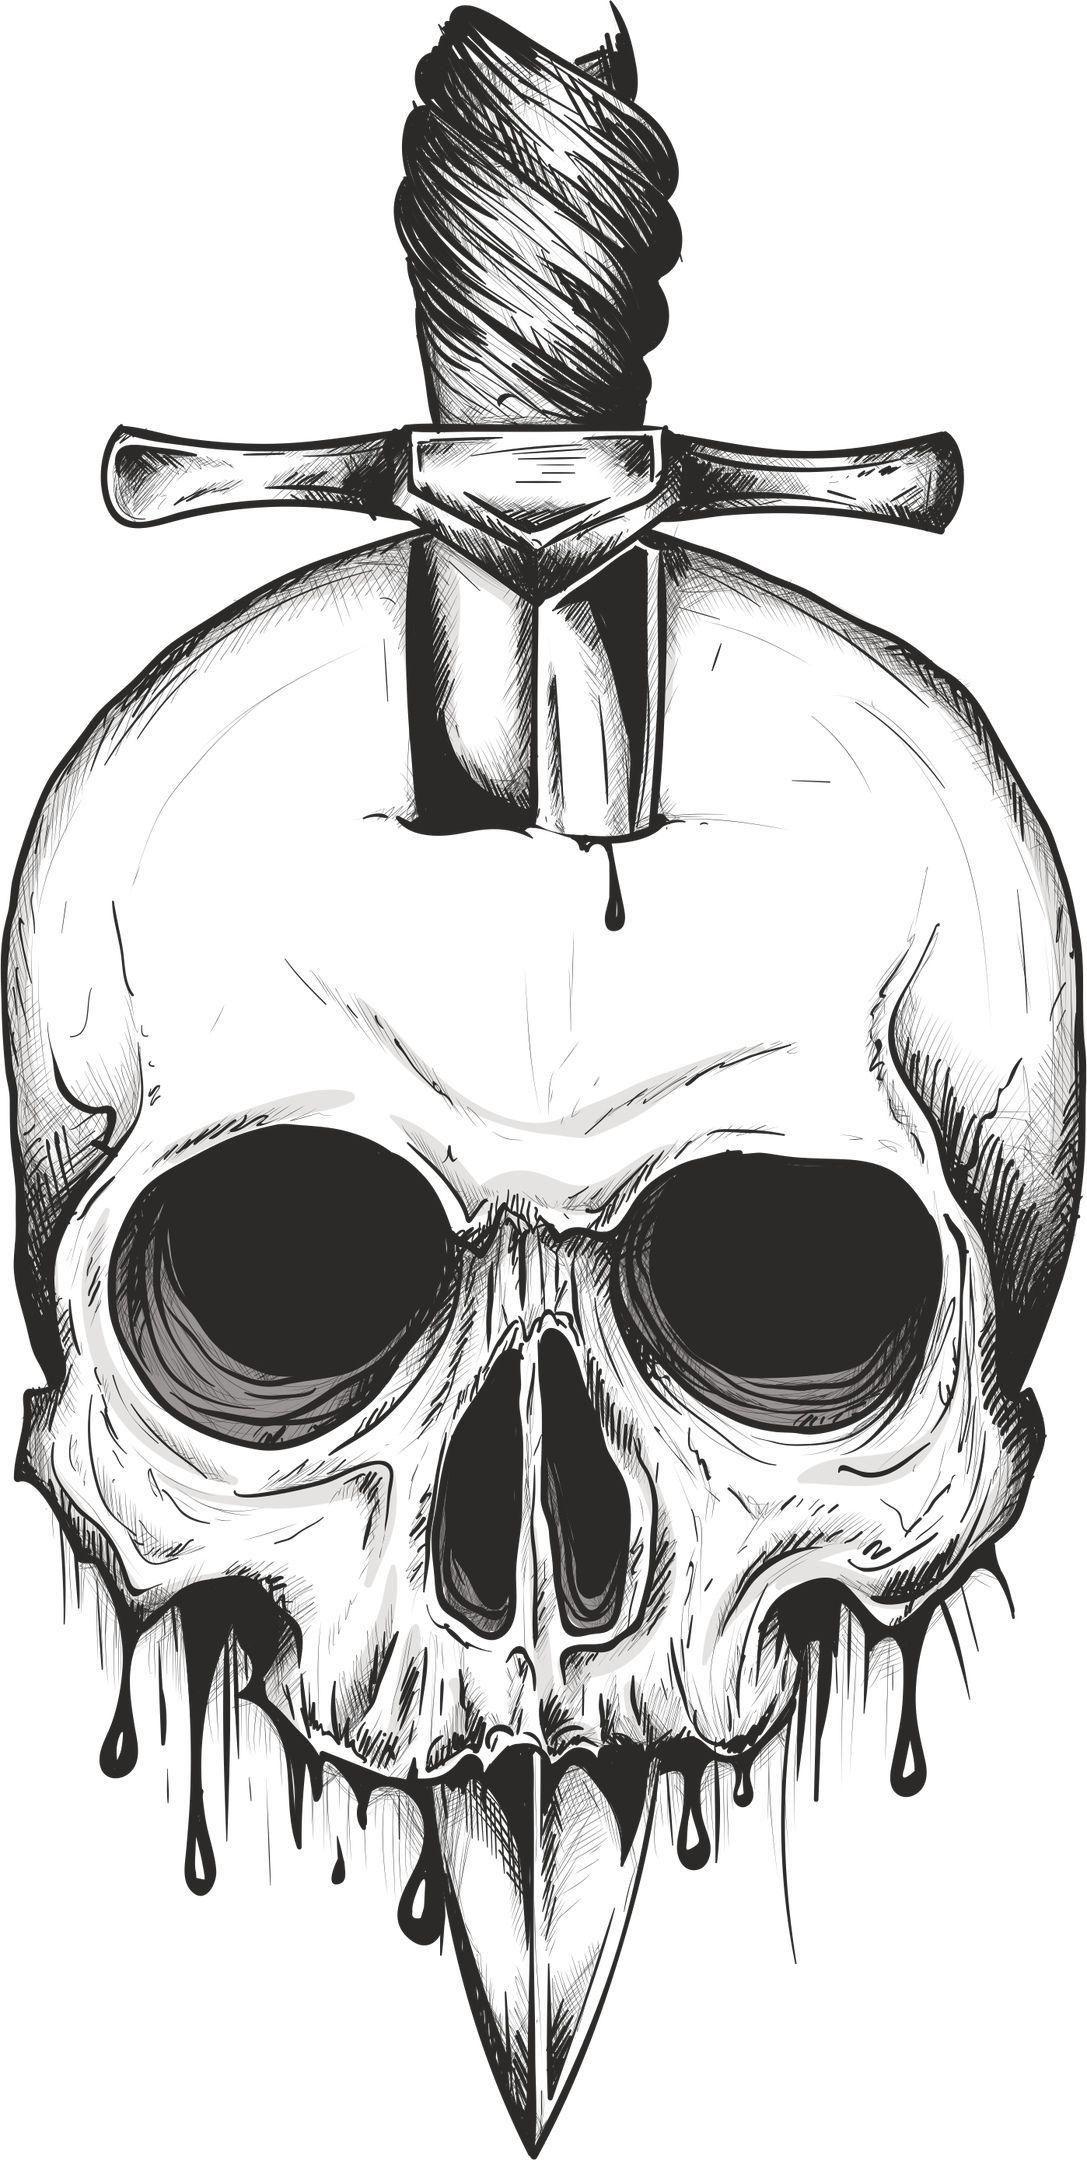 Sword Skull Print Free Vector cdr Download in 2020 Skull